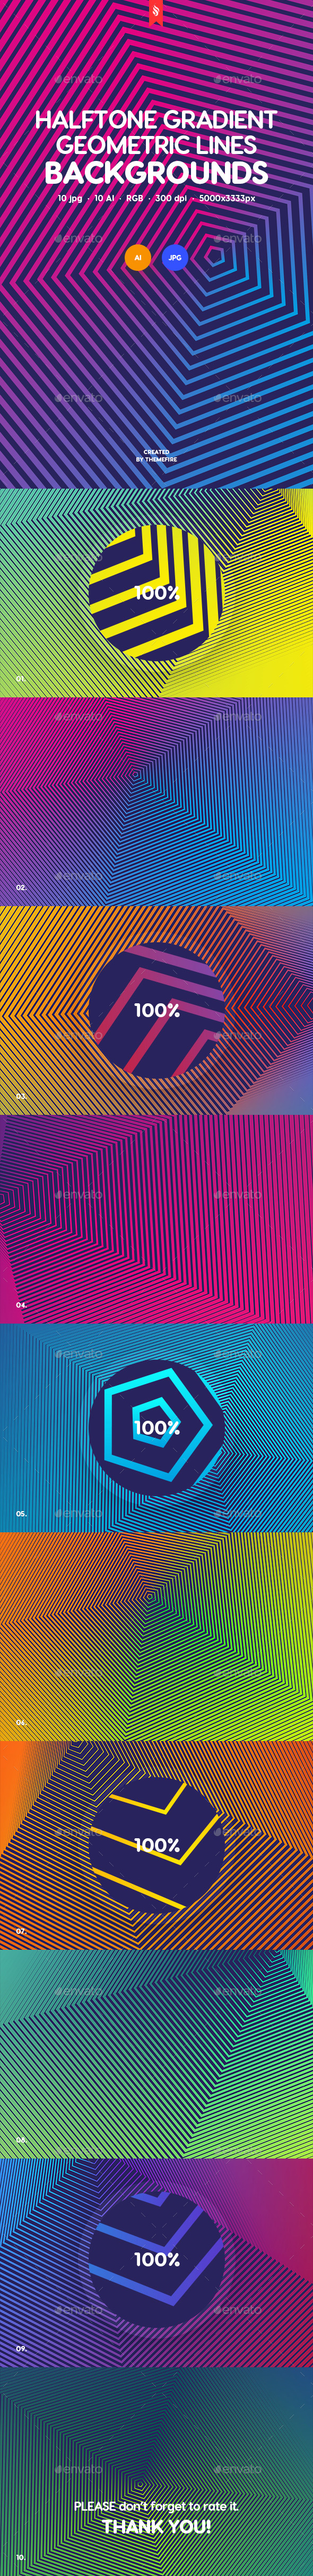 Halftone Gradient Geometric Lines Backgrounds - Tech / Futuristic Backgrounds